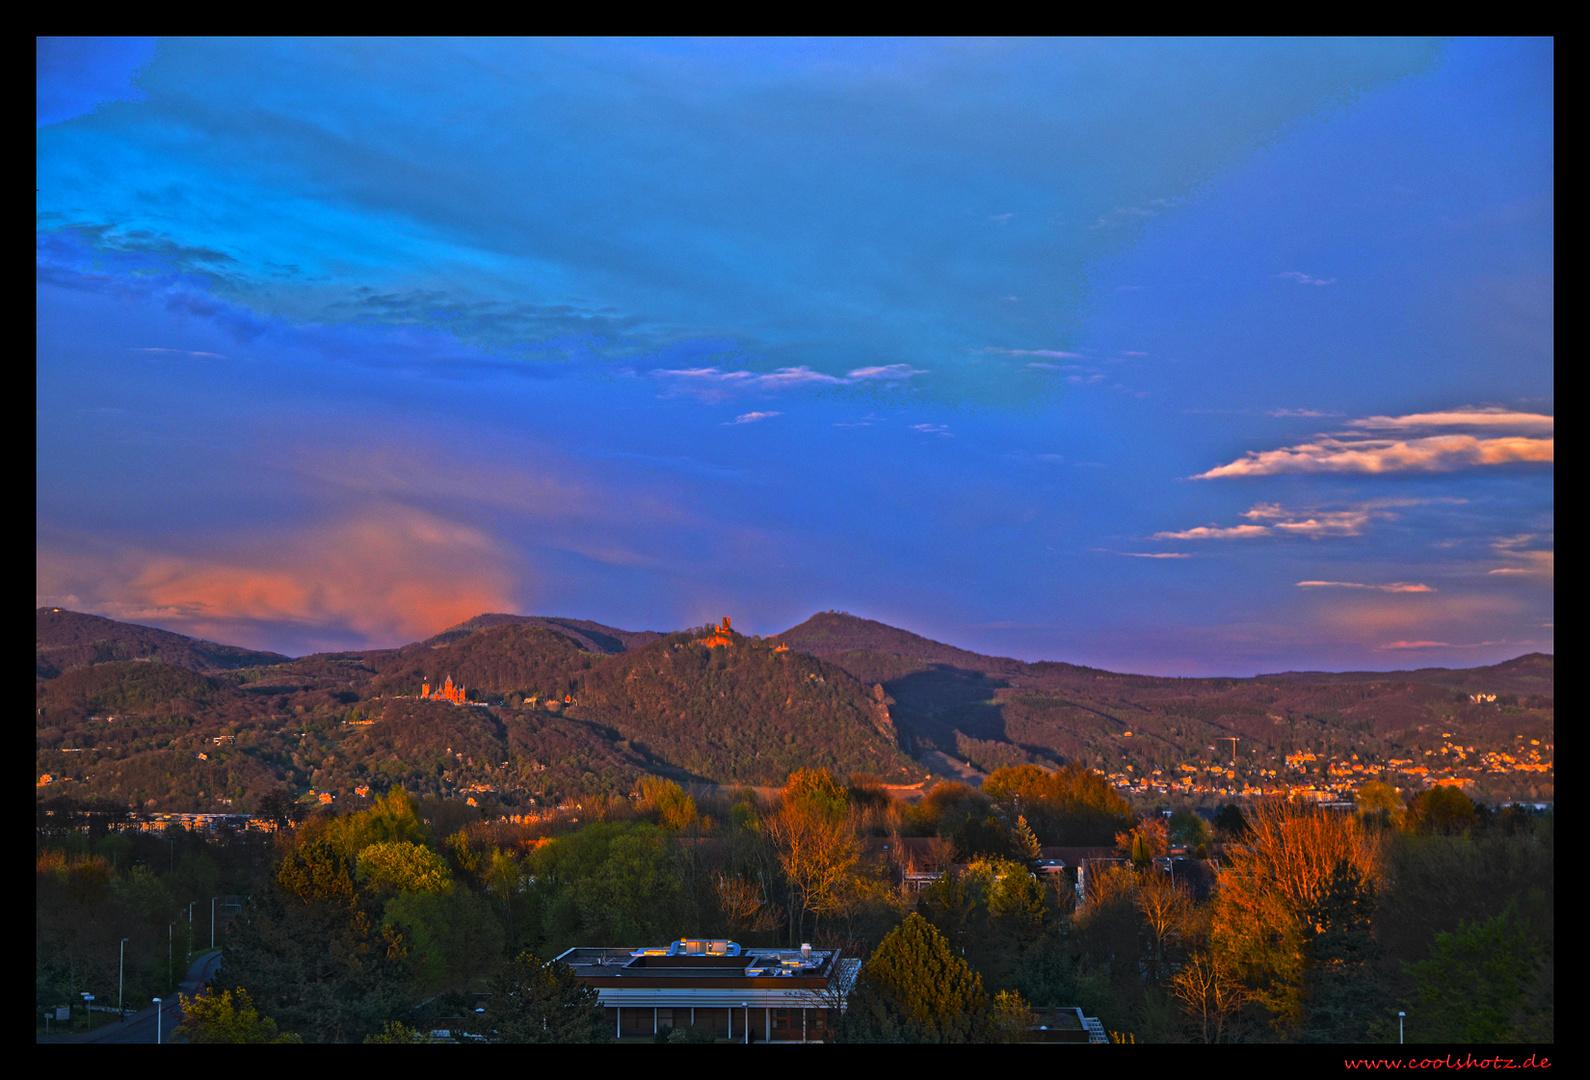 Sonnenaufgang über dem Drachenfels